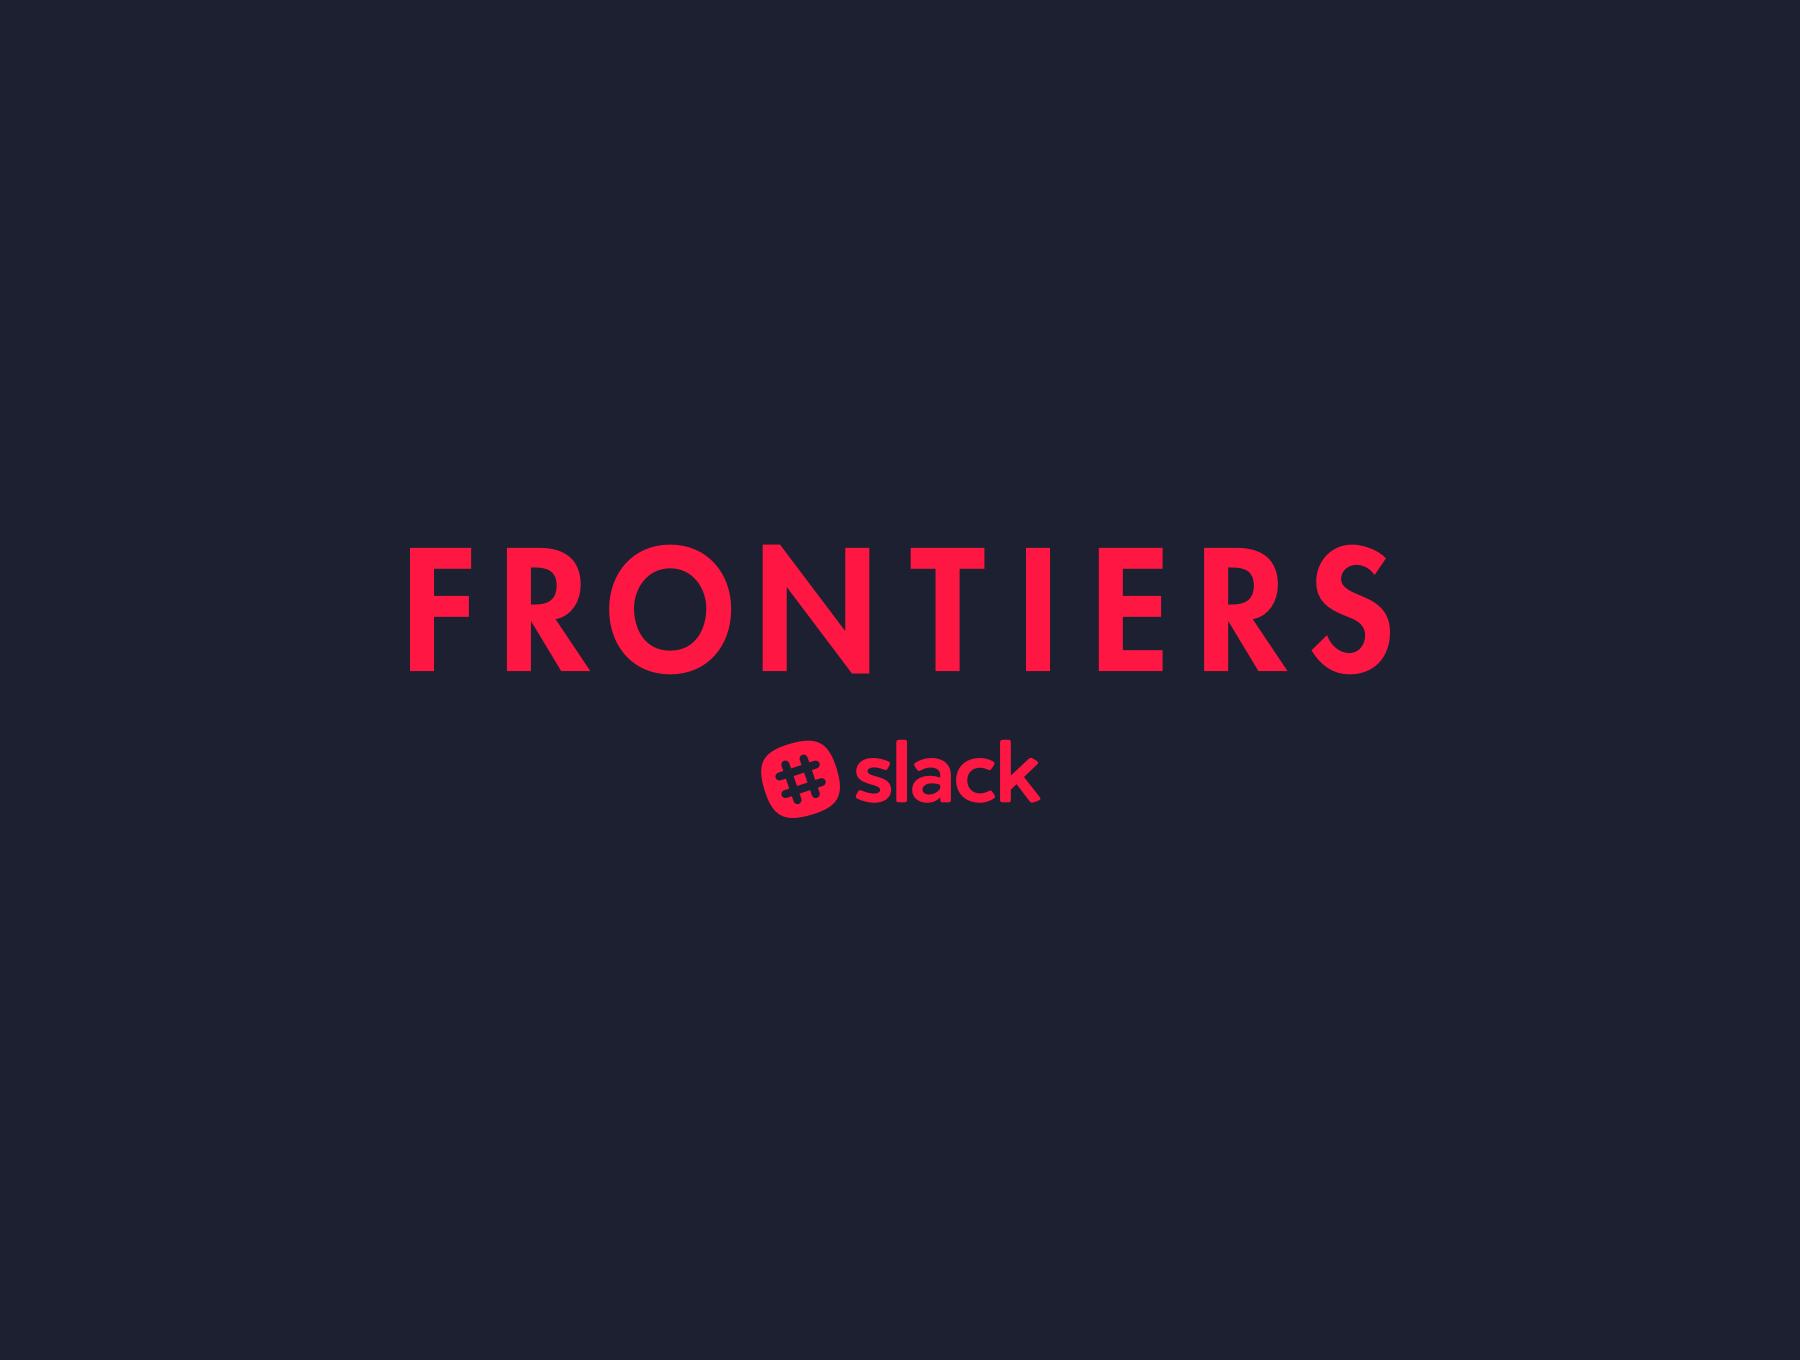 thumbnail-slackfrontiers@2x.png